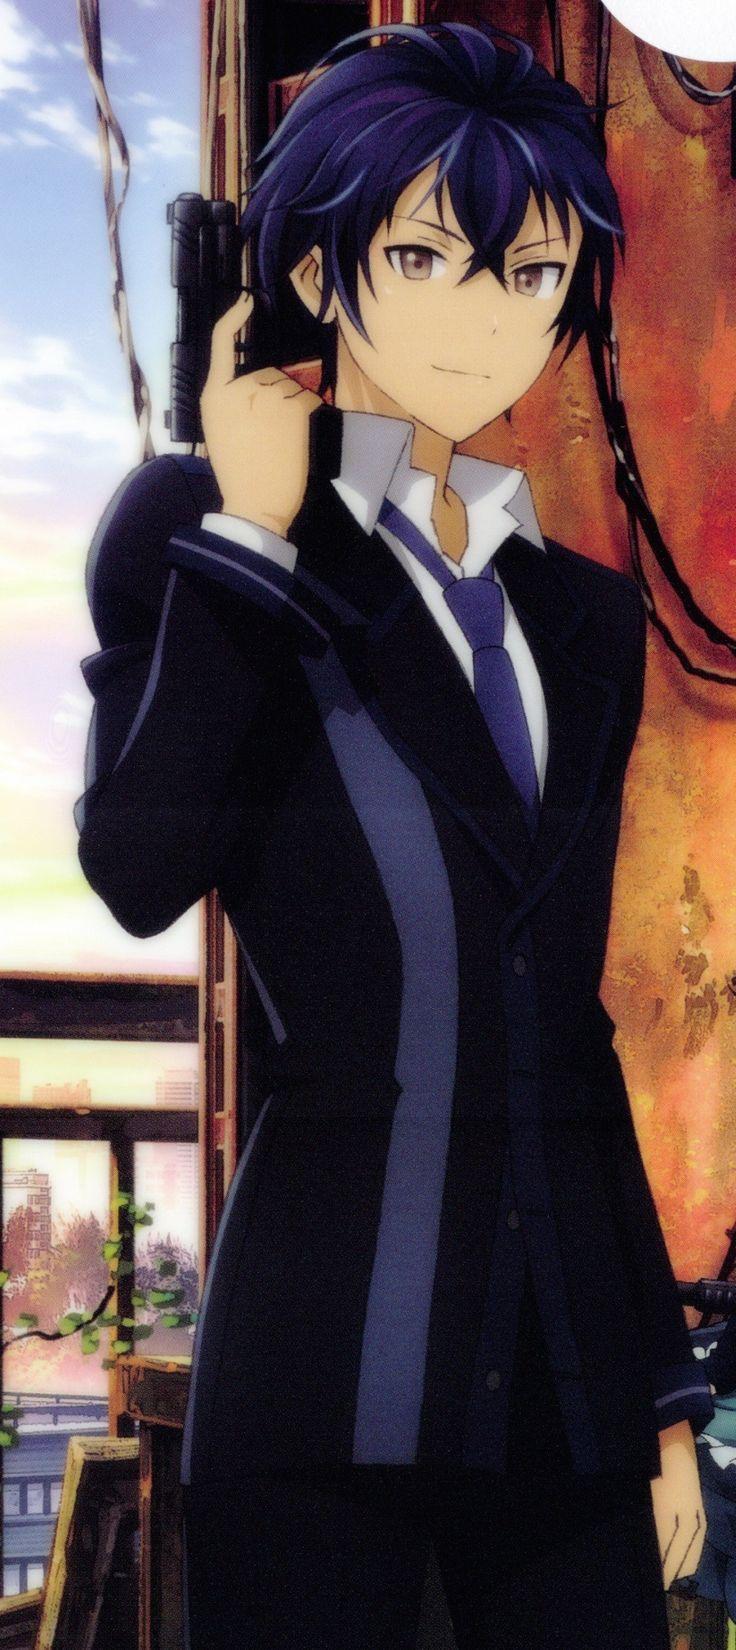 Rentaro Satomi [Black Bullet • Burakku Buretto] <3 <3